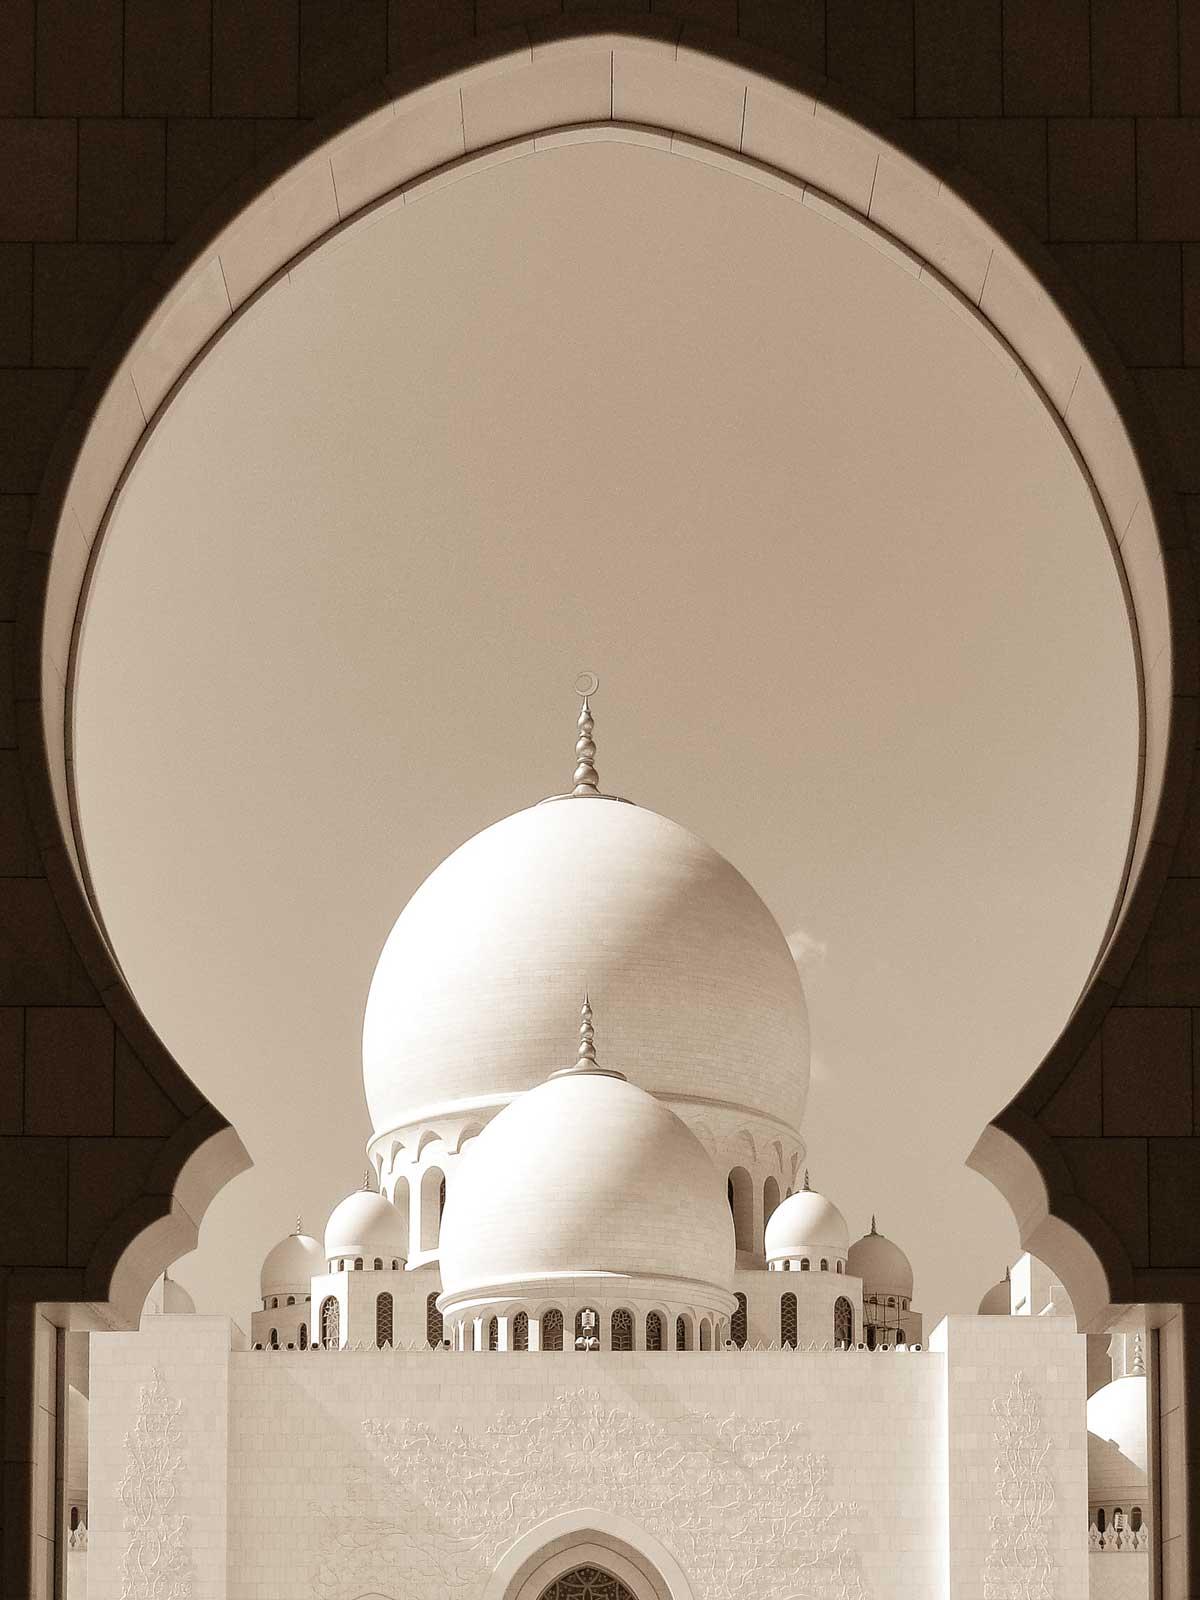 Sheikh Zayed Grand Mosque, Abu Dhabi - United Arab Emirates